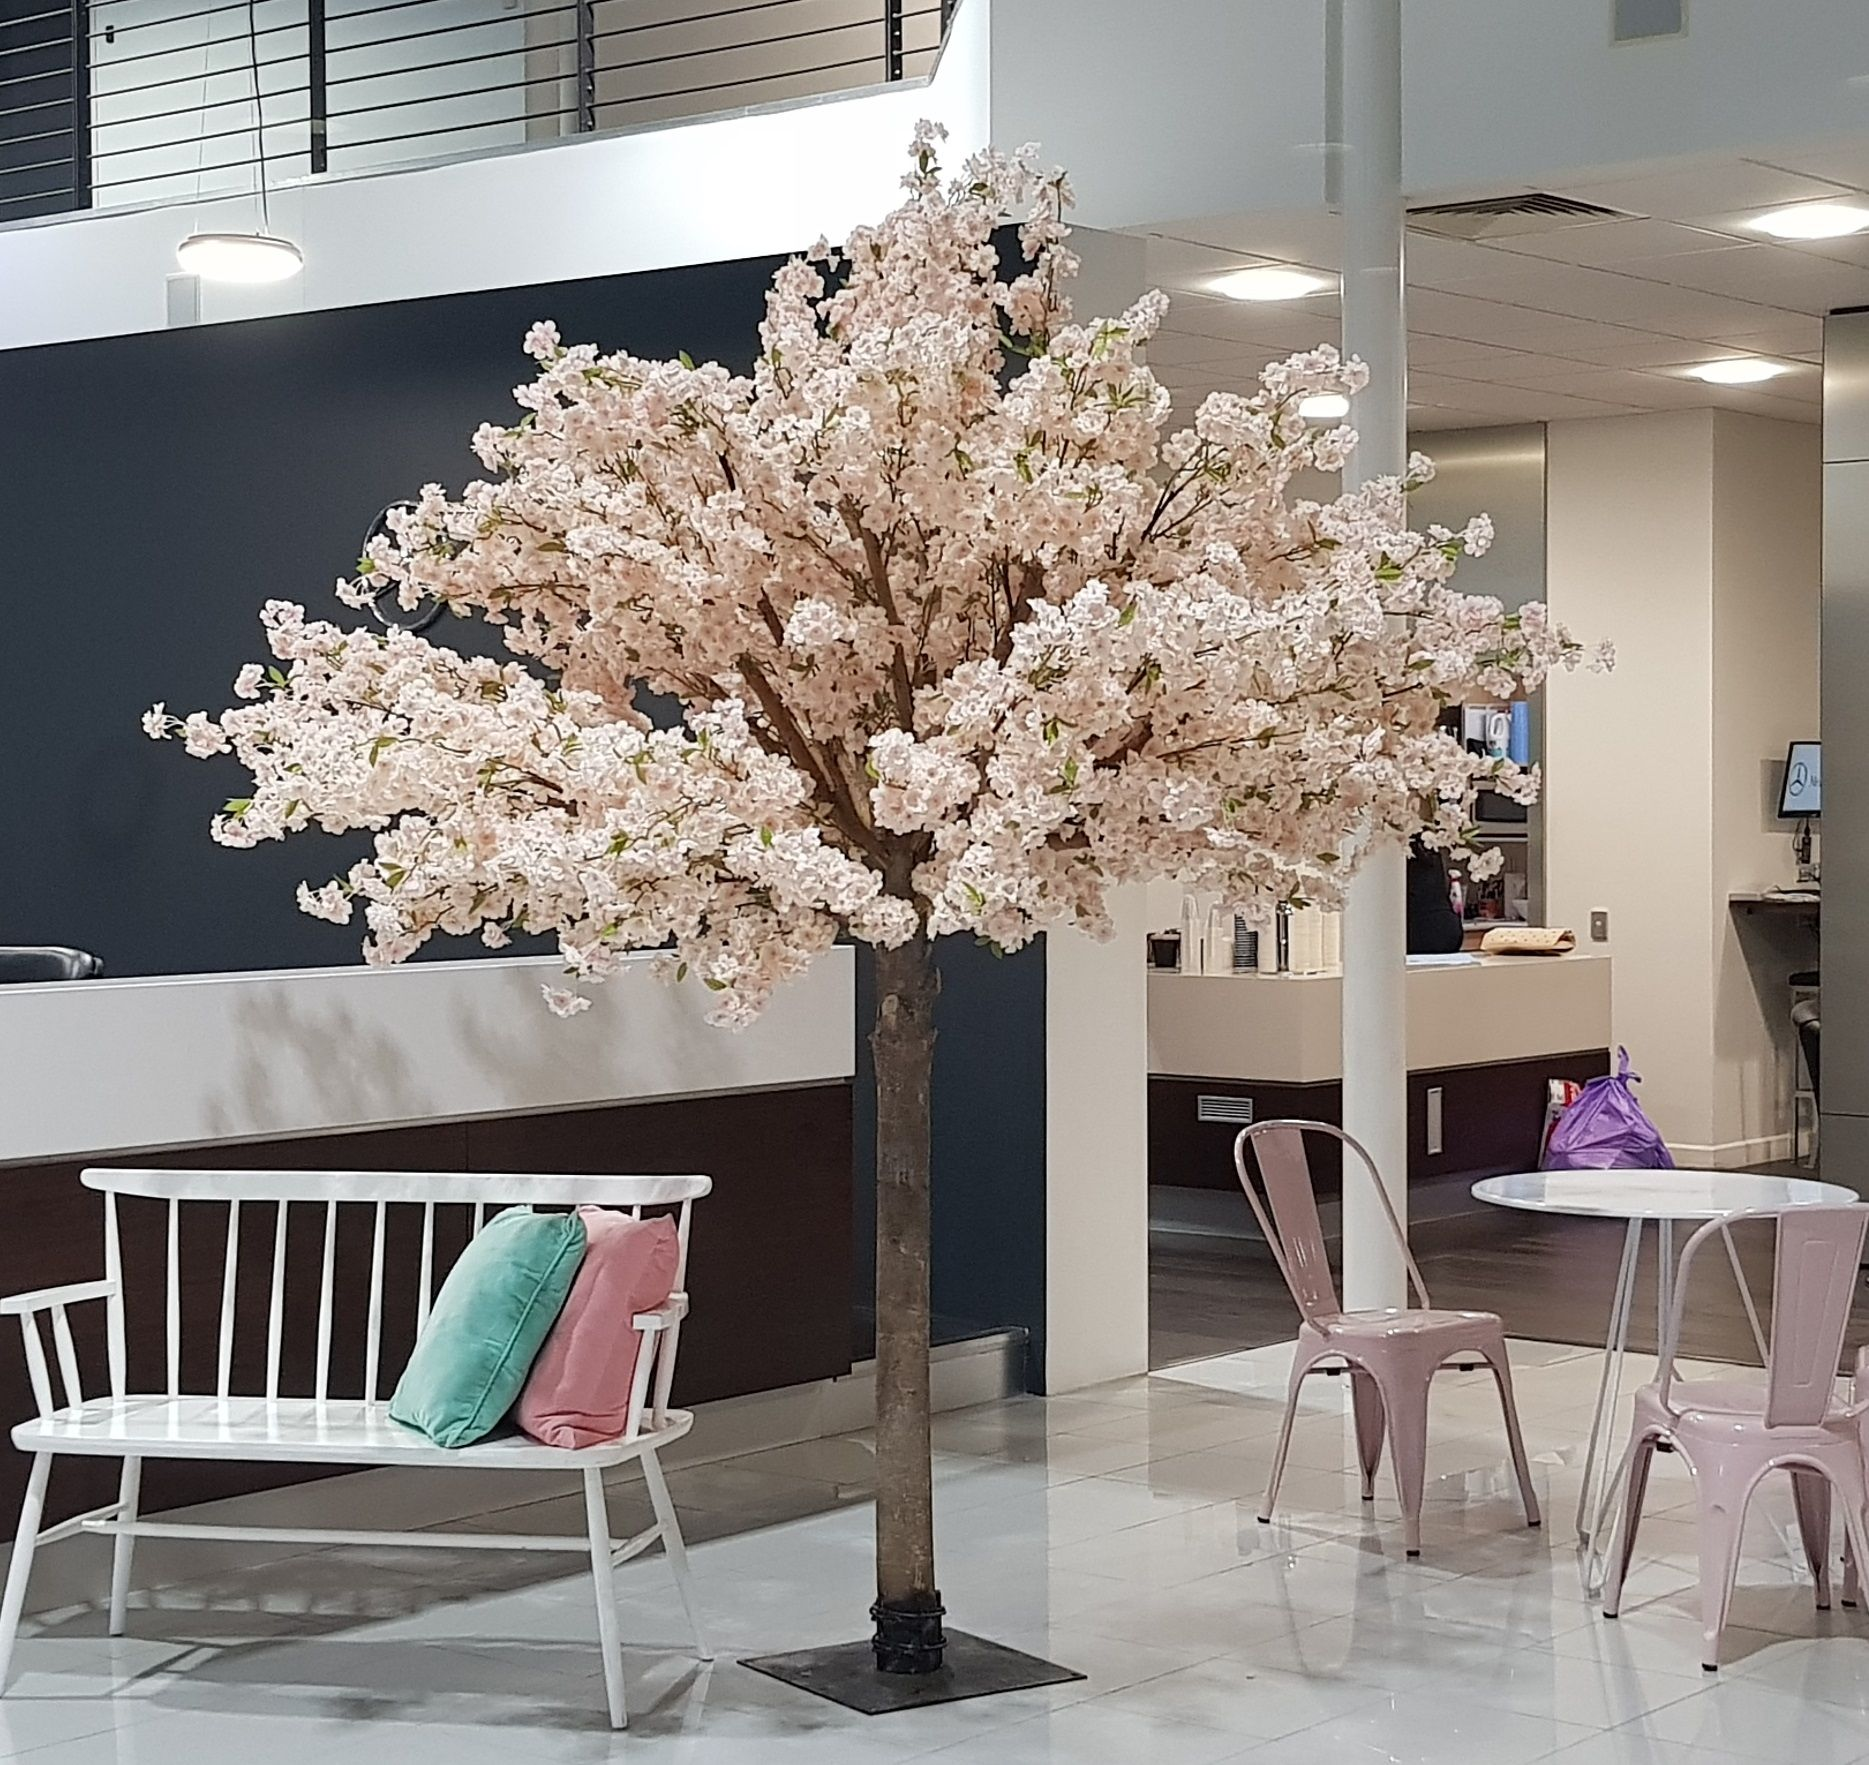 Our 2 5m High Upright Pink Cherry Blossom Trees Mercedesbenzgoldcoast Wedding Goldcoastwedd Pink Cherry Blossom Tree Insta Wedding Cherry Blossom Tree